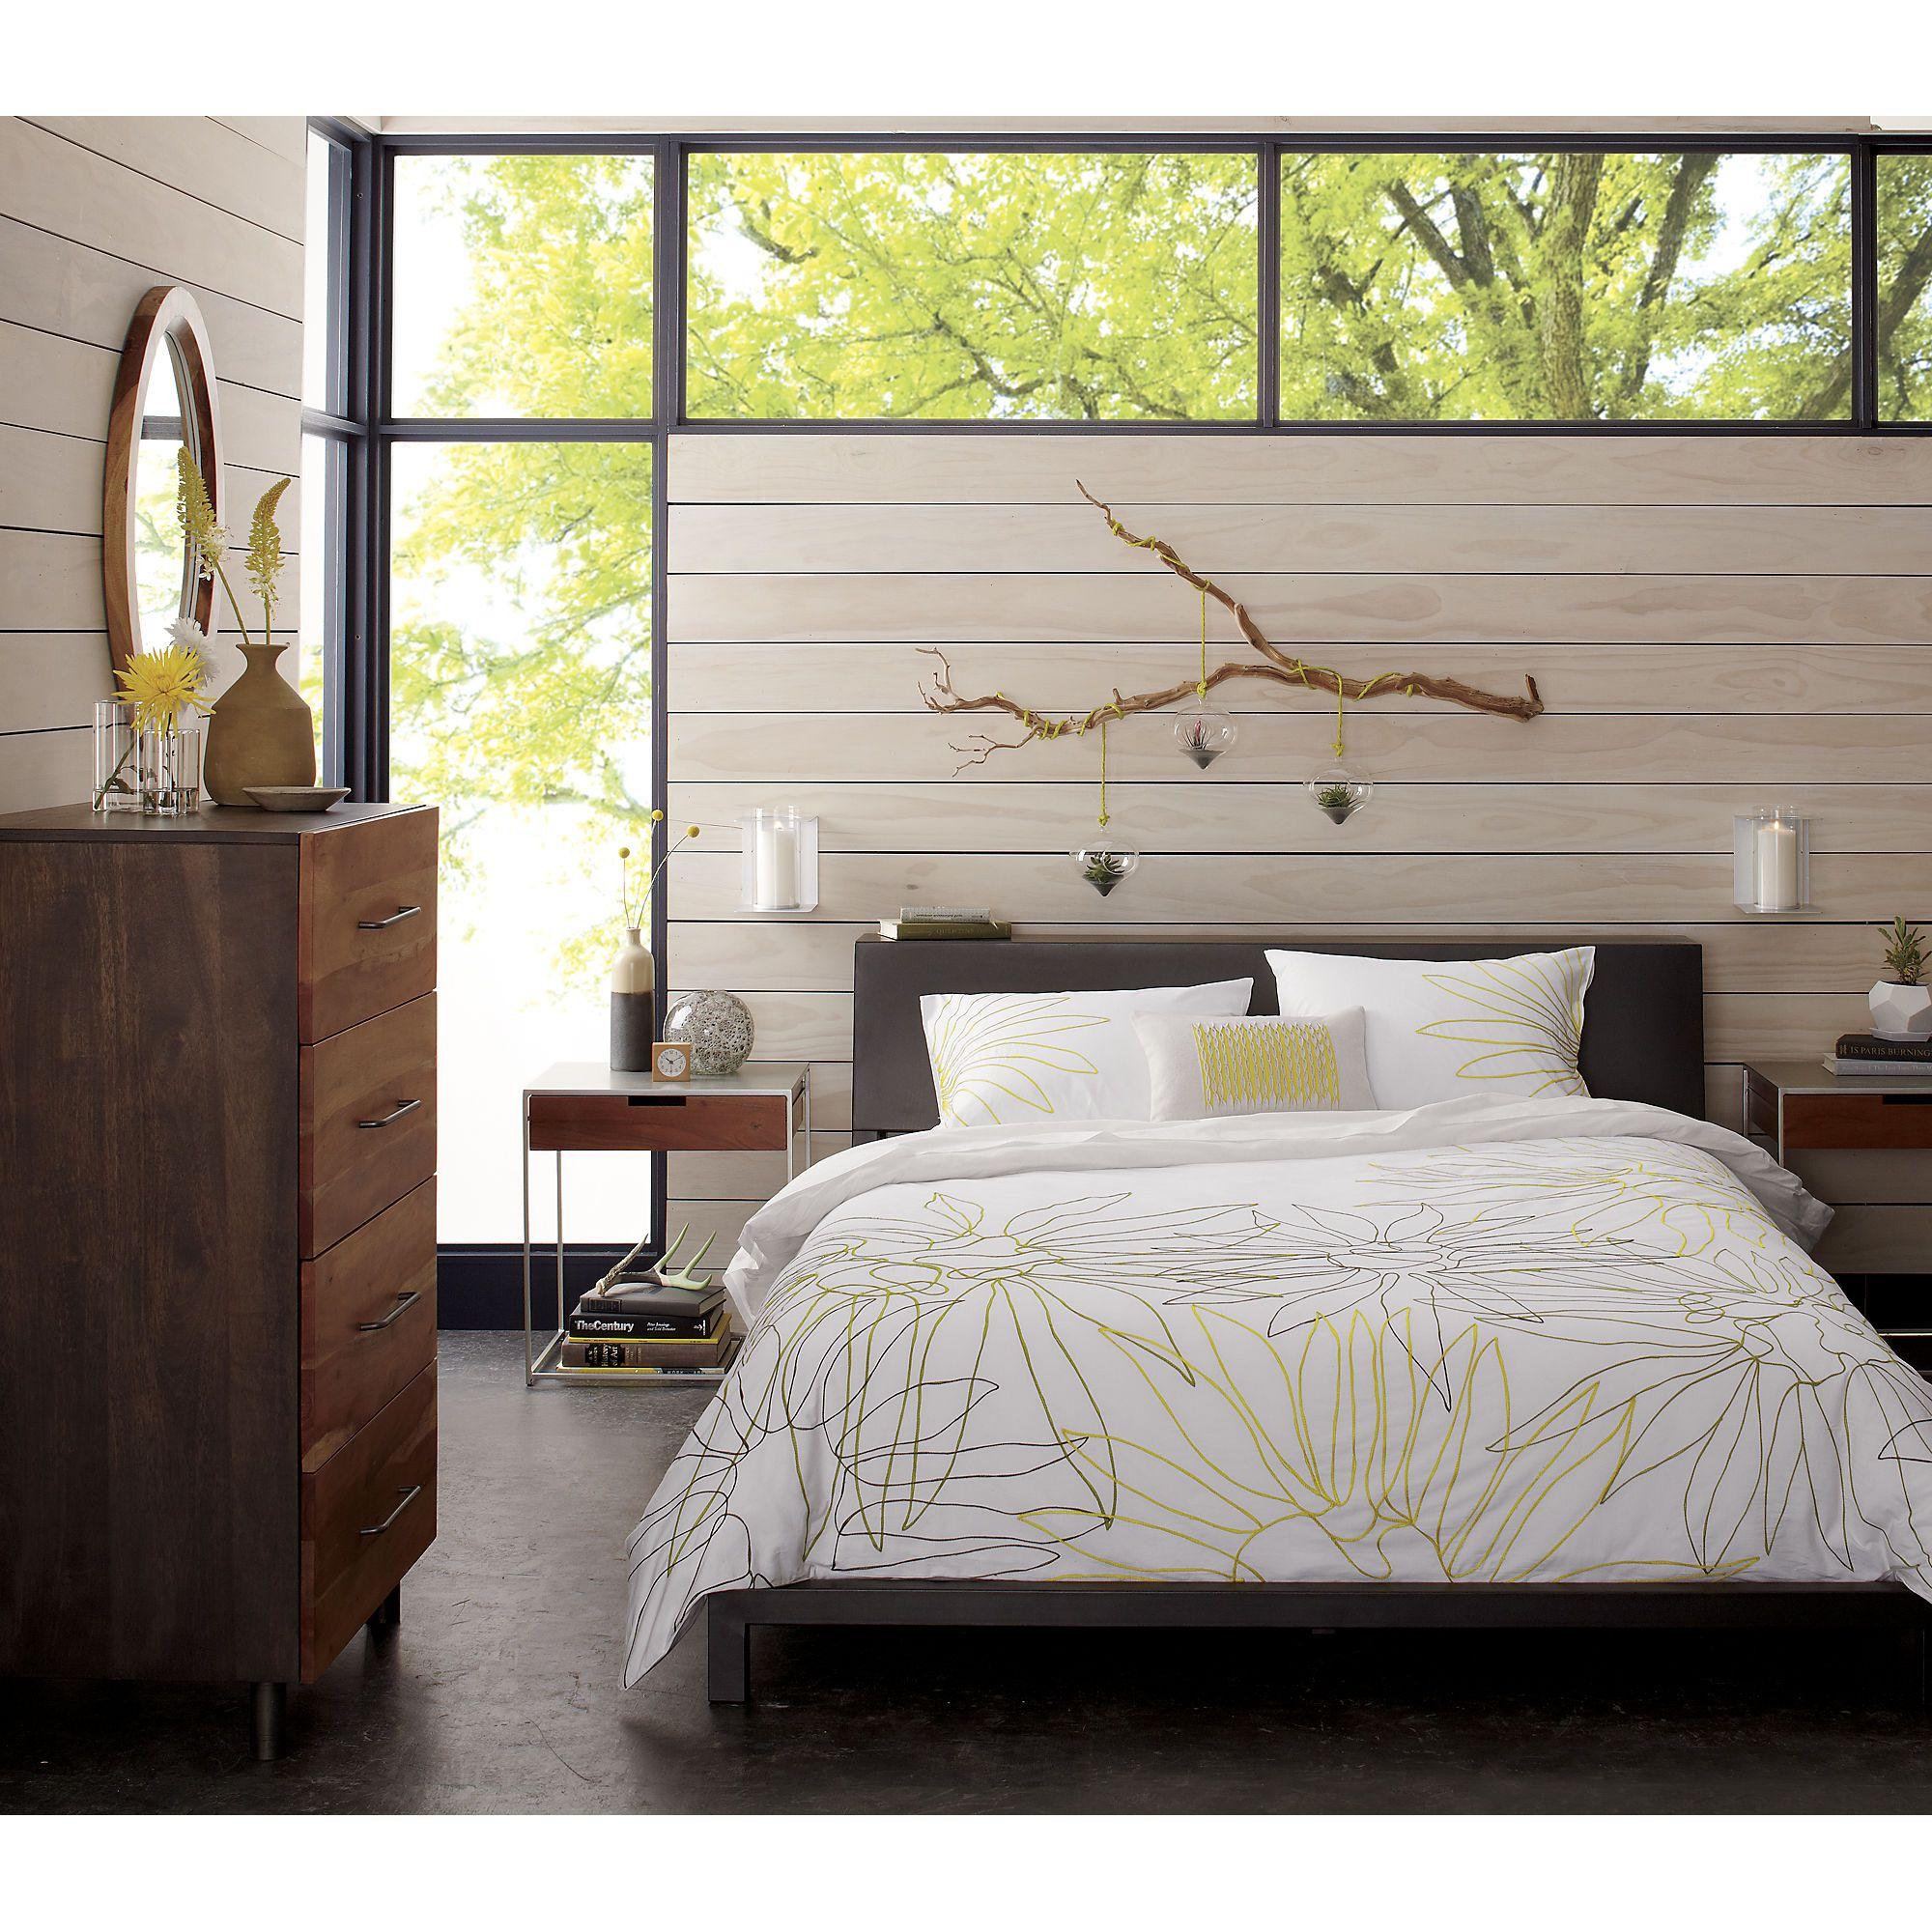 Best Audrey Nightstand Cb2 Hanging Glass Terrarium 400 x 300